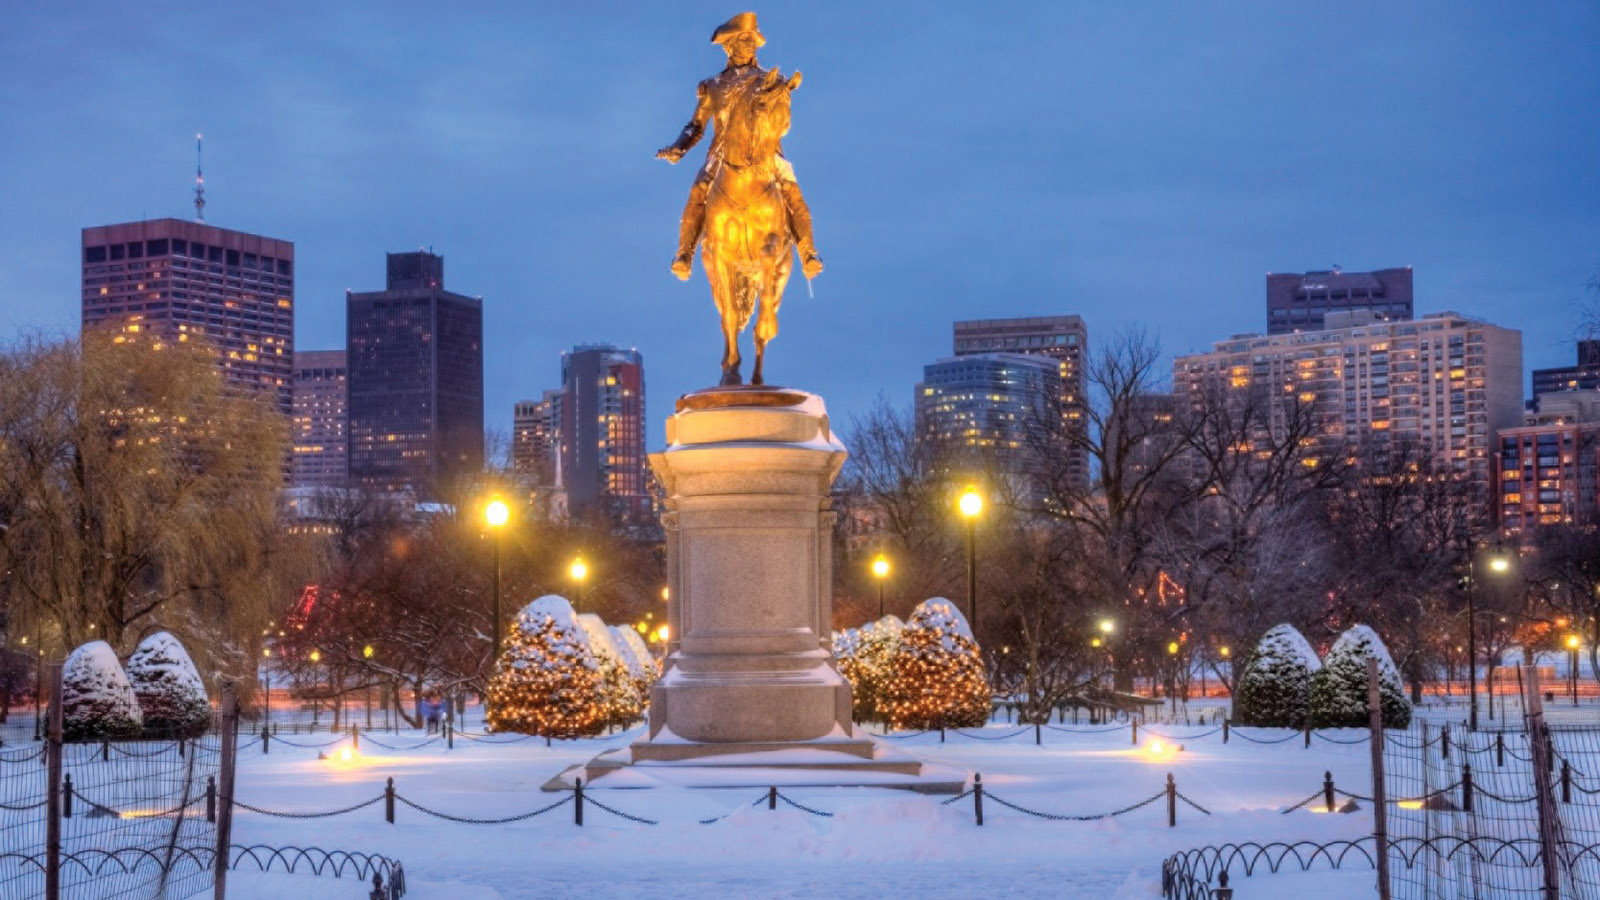 four seasons hotels offer urban getaways this holiday season